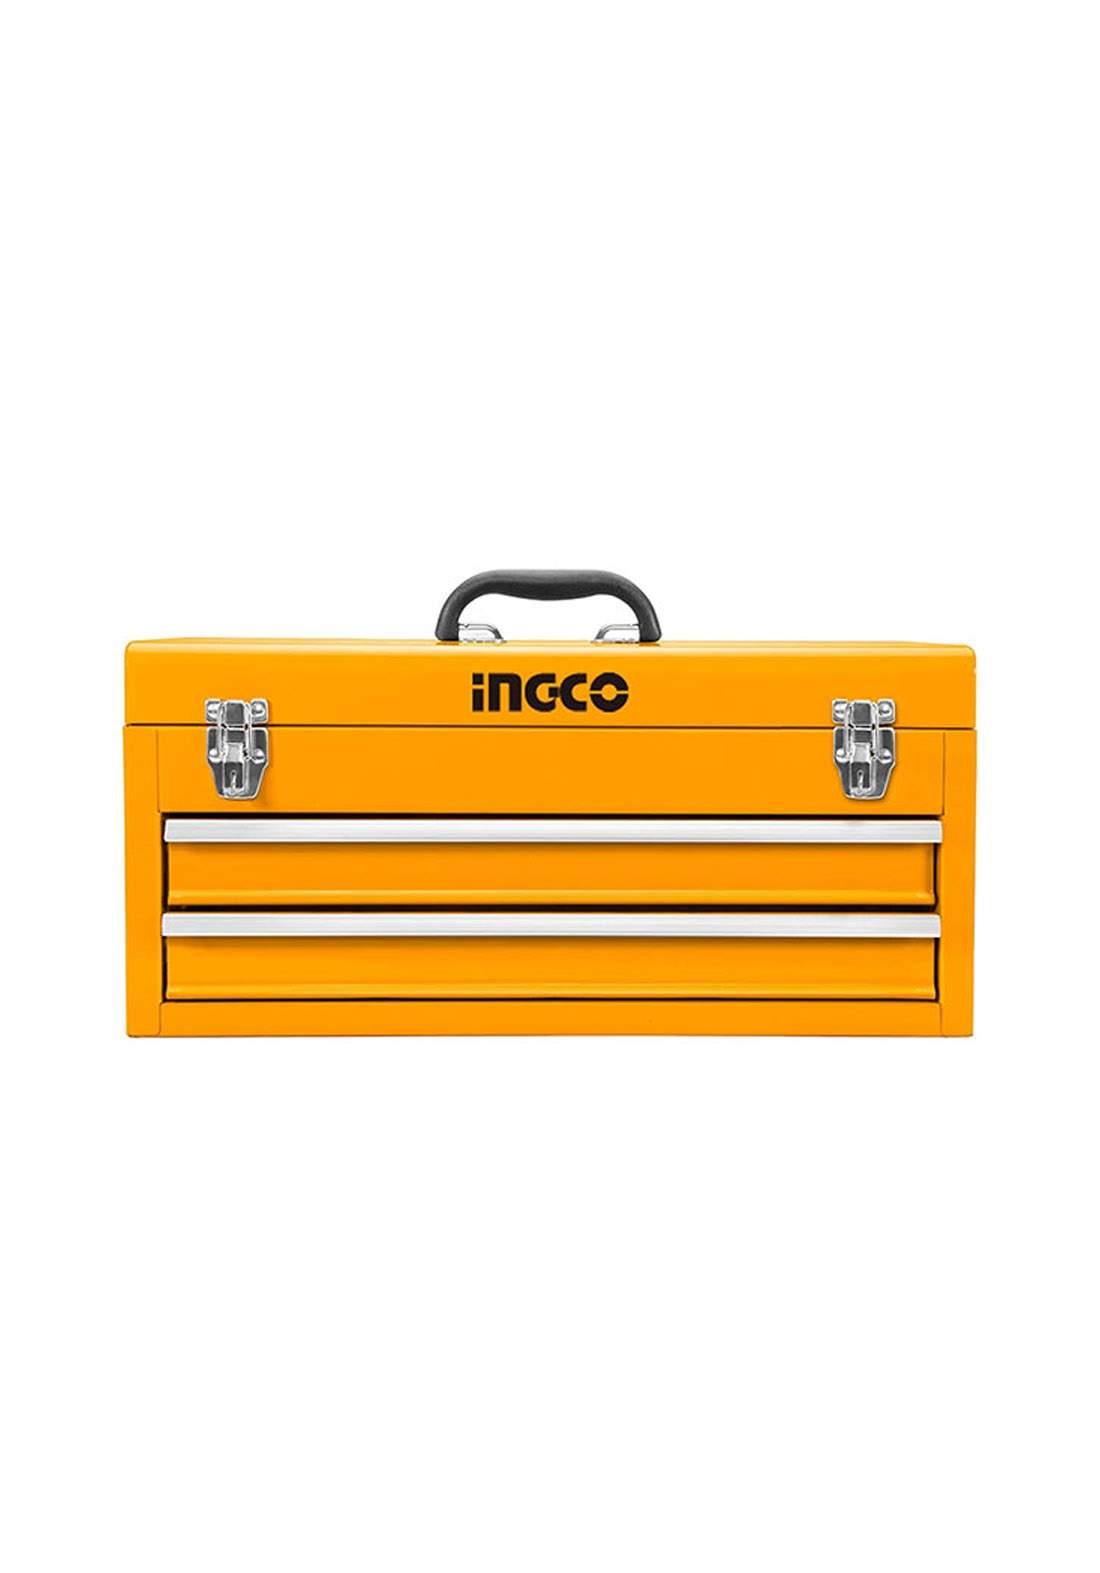 Ingco HTB06 Metal Tool Box Yallow  صندوق حفظ وتنظيم العُدد